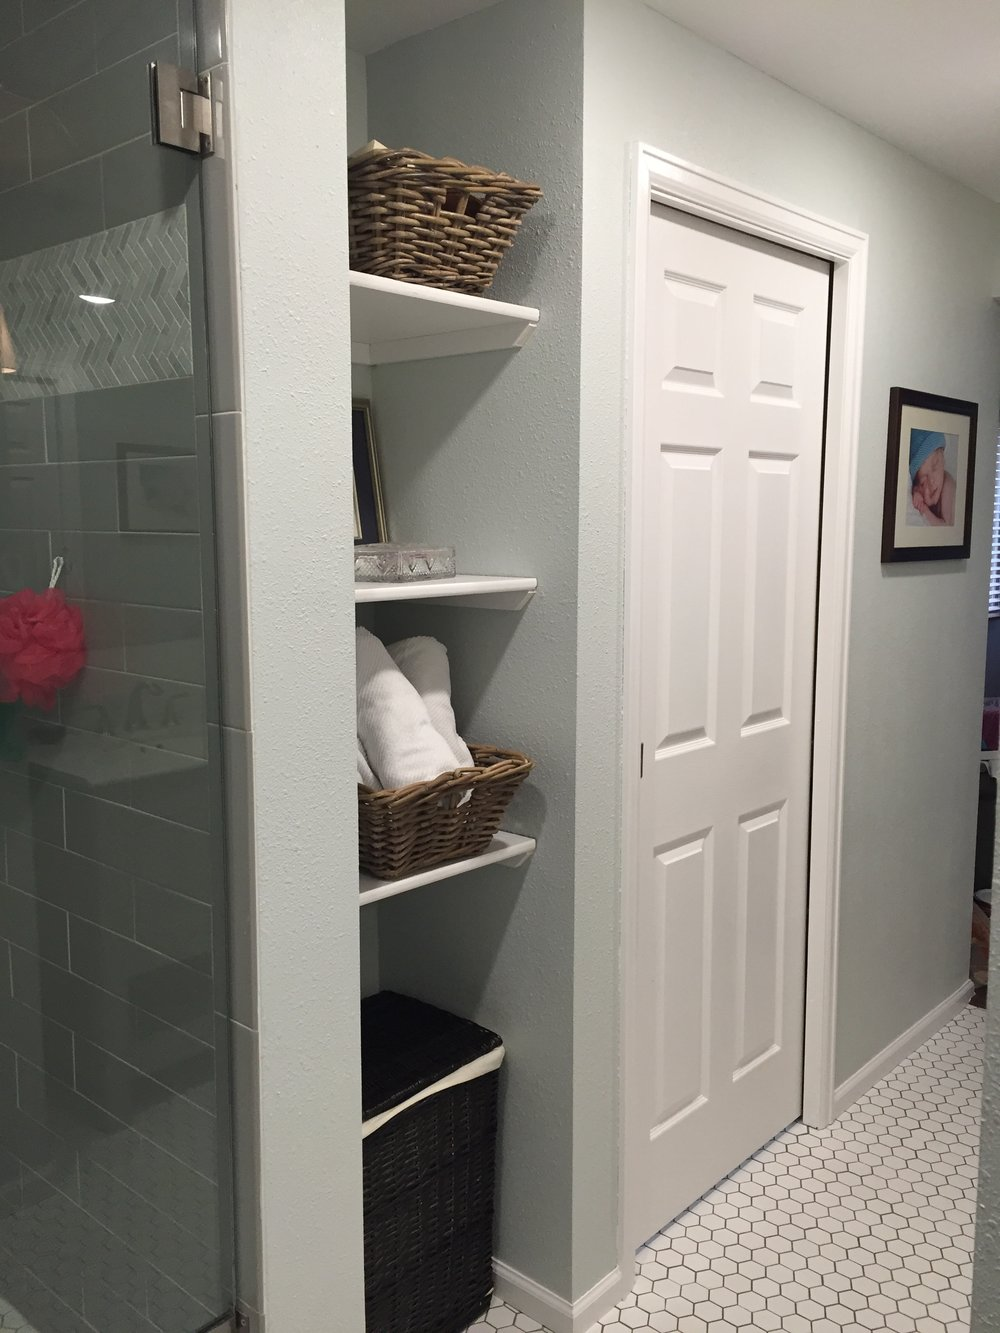 Built in shelving in master bathroom